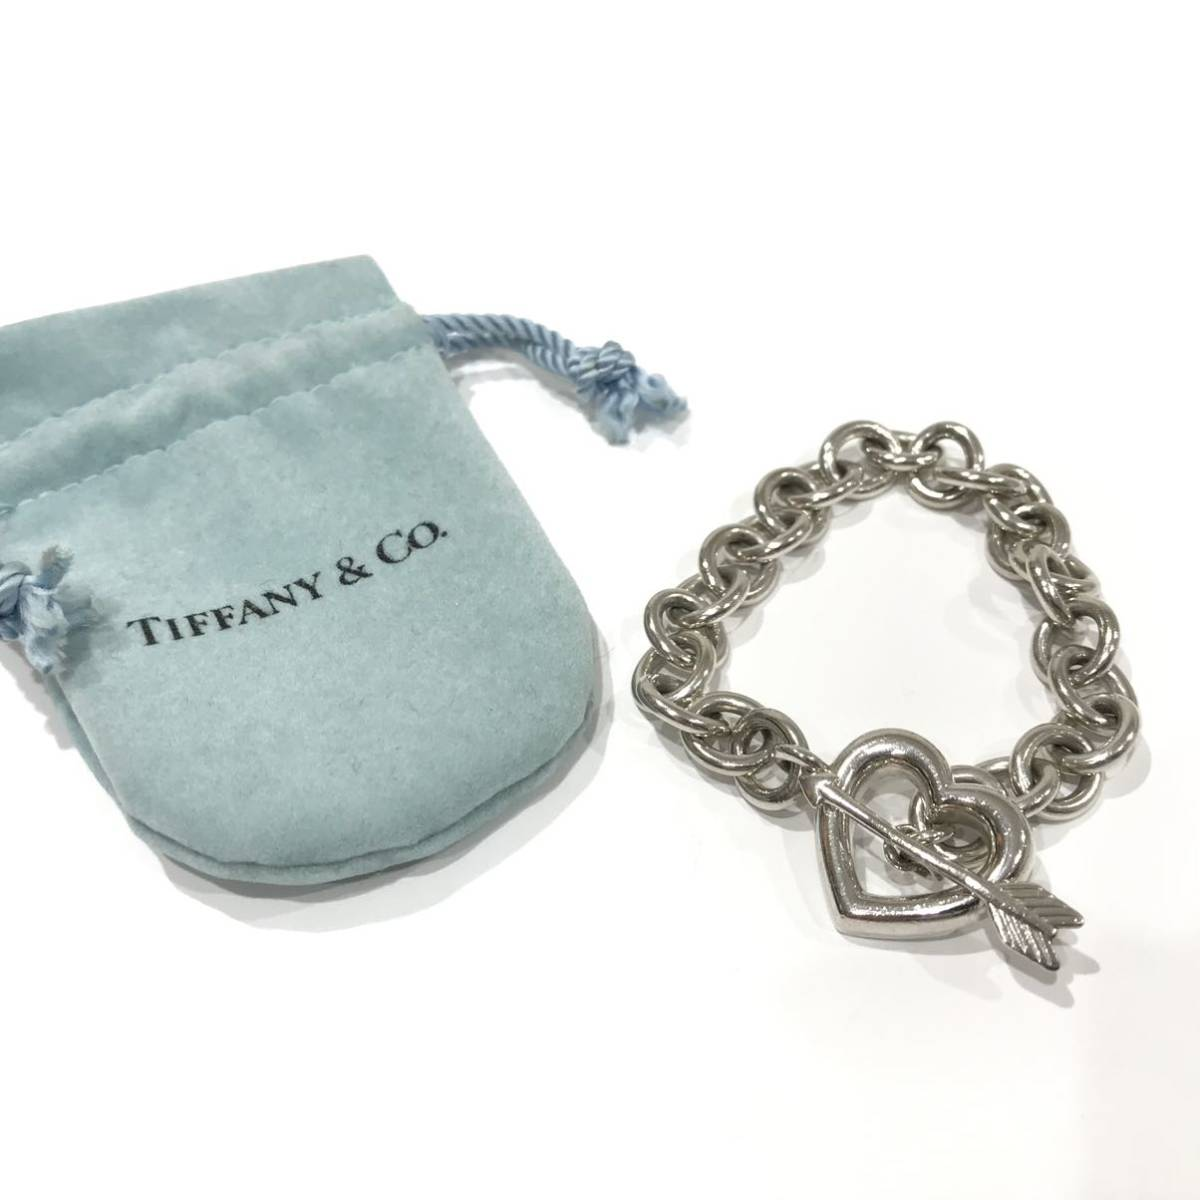 TIFFANY&Co. ティファニー ブレスレット ハート アロー シルバー 925 袋付き (AJ20)